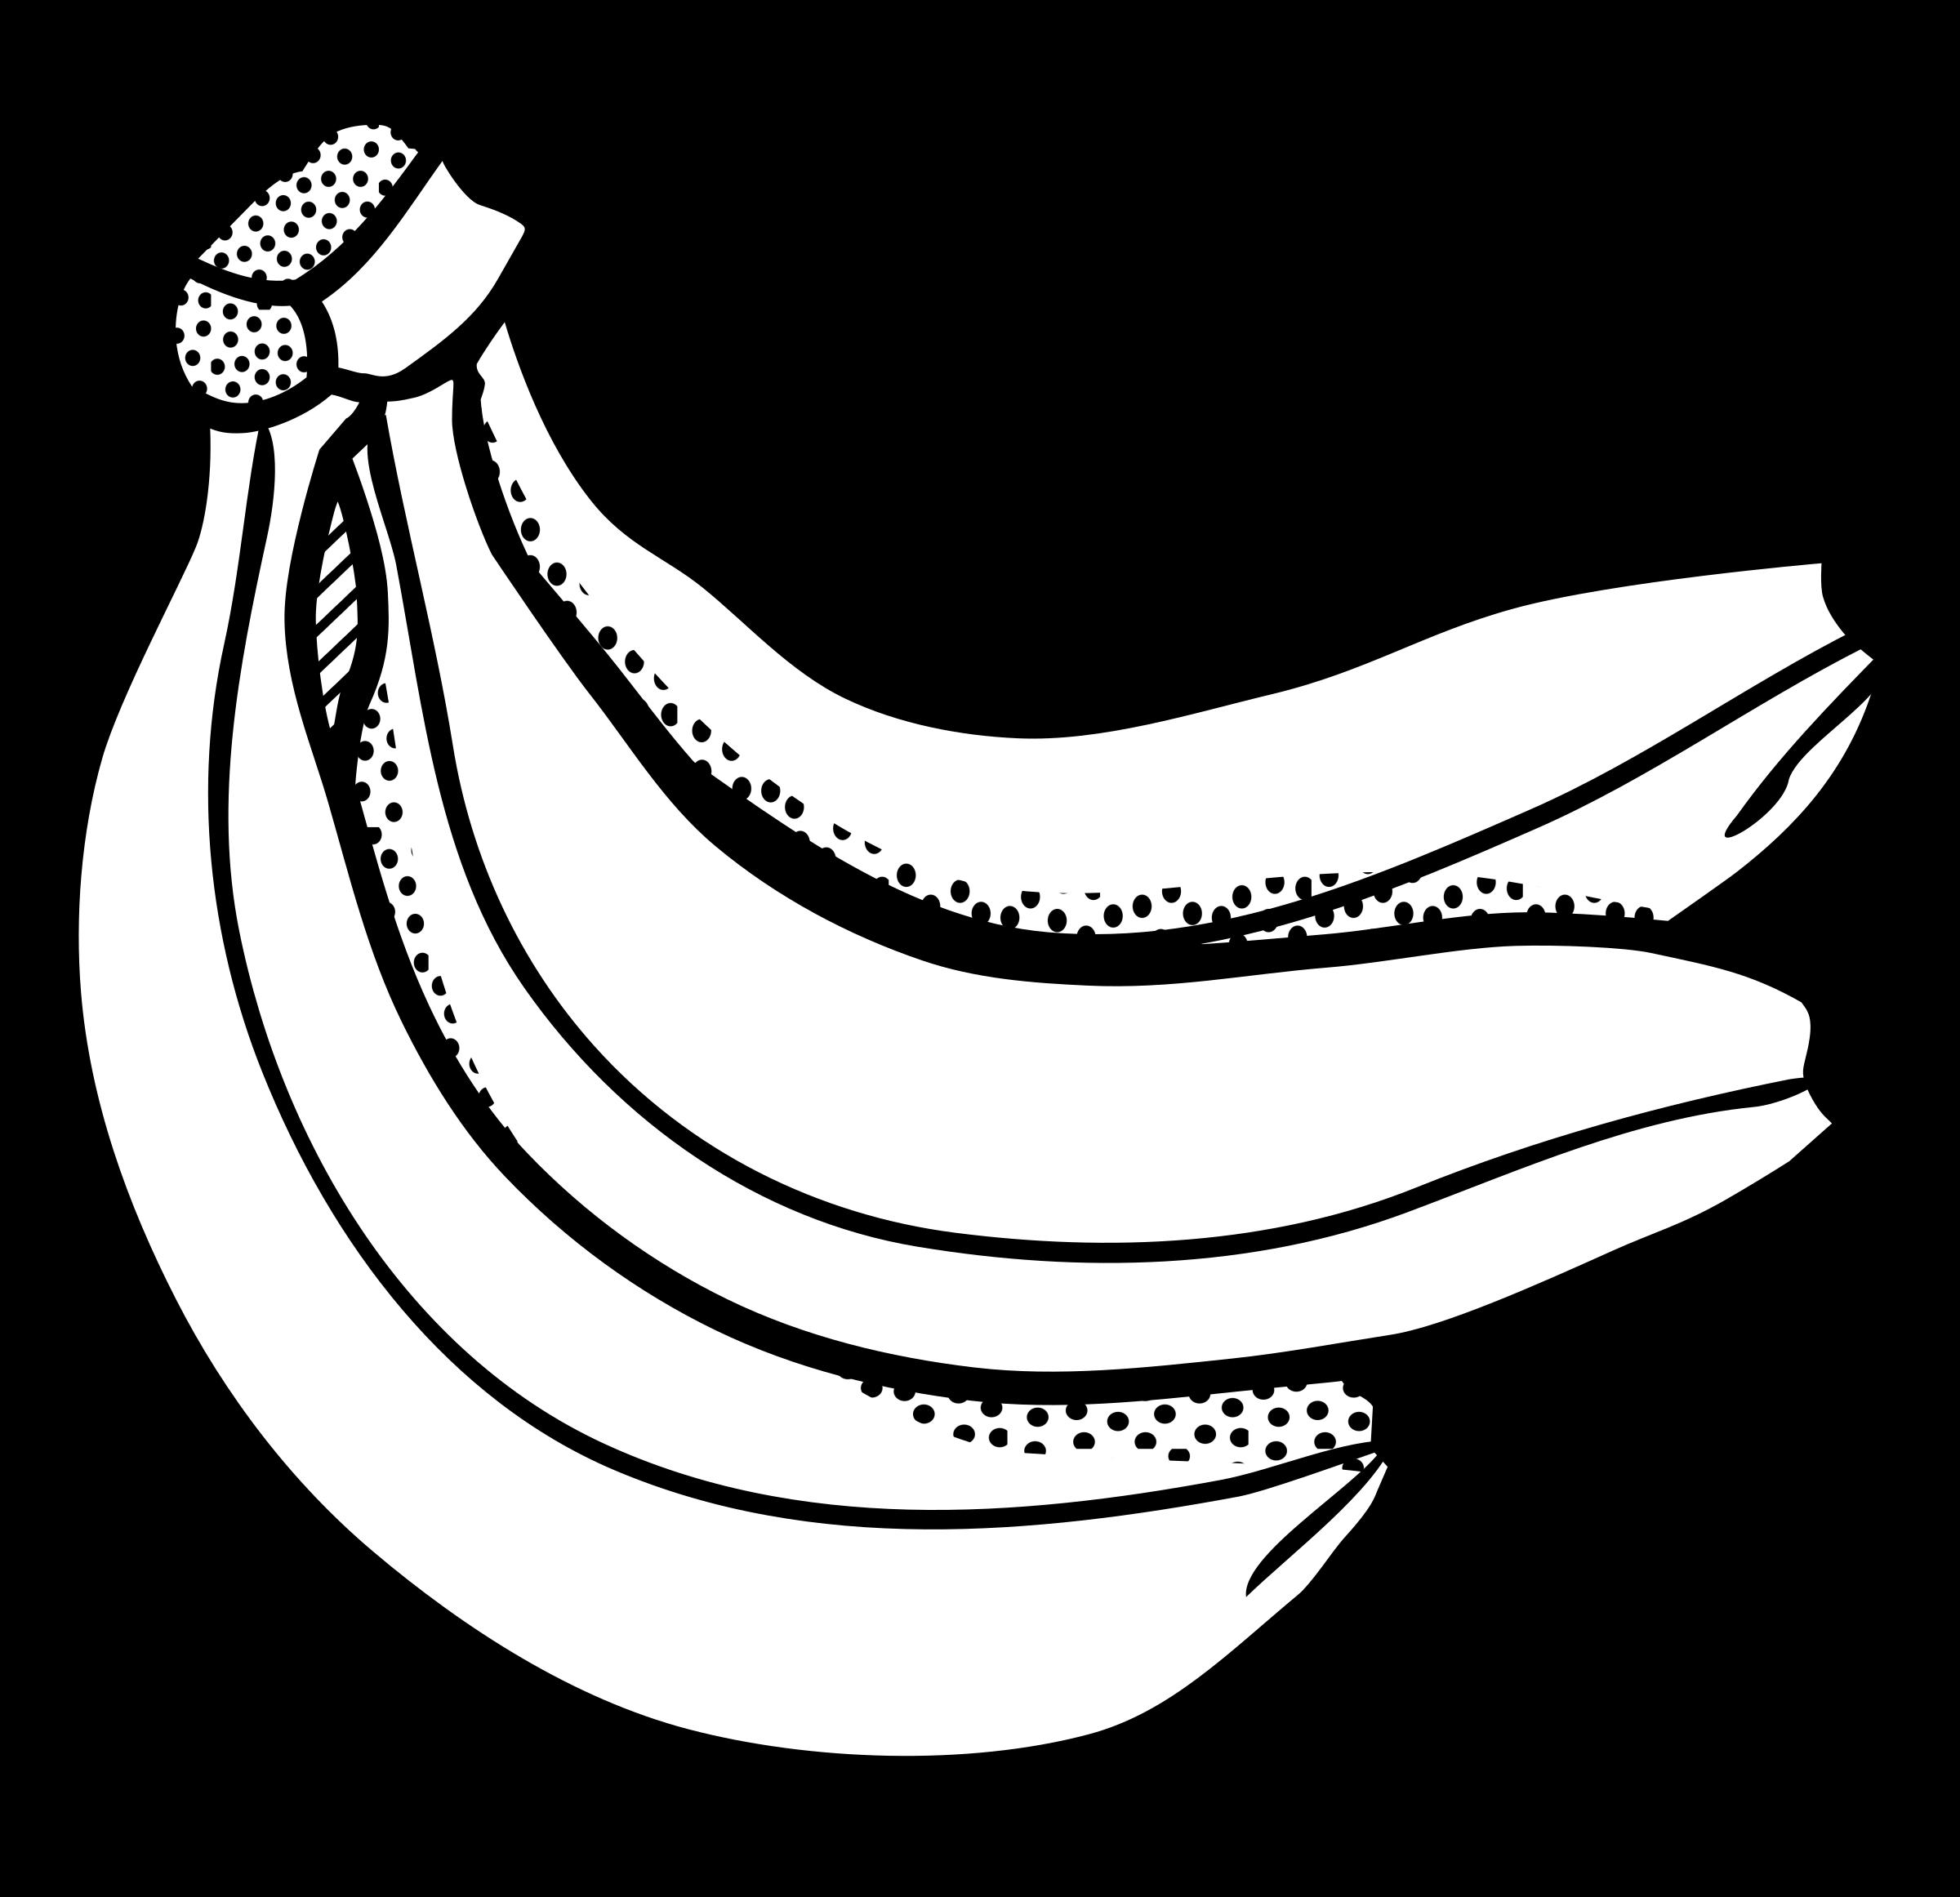 image freeuse library Bananas drawing easy. Banana outline at getdrawings